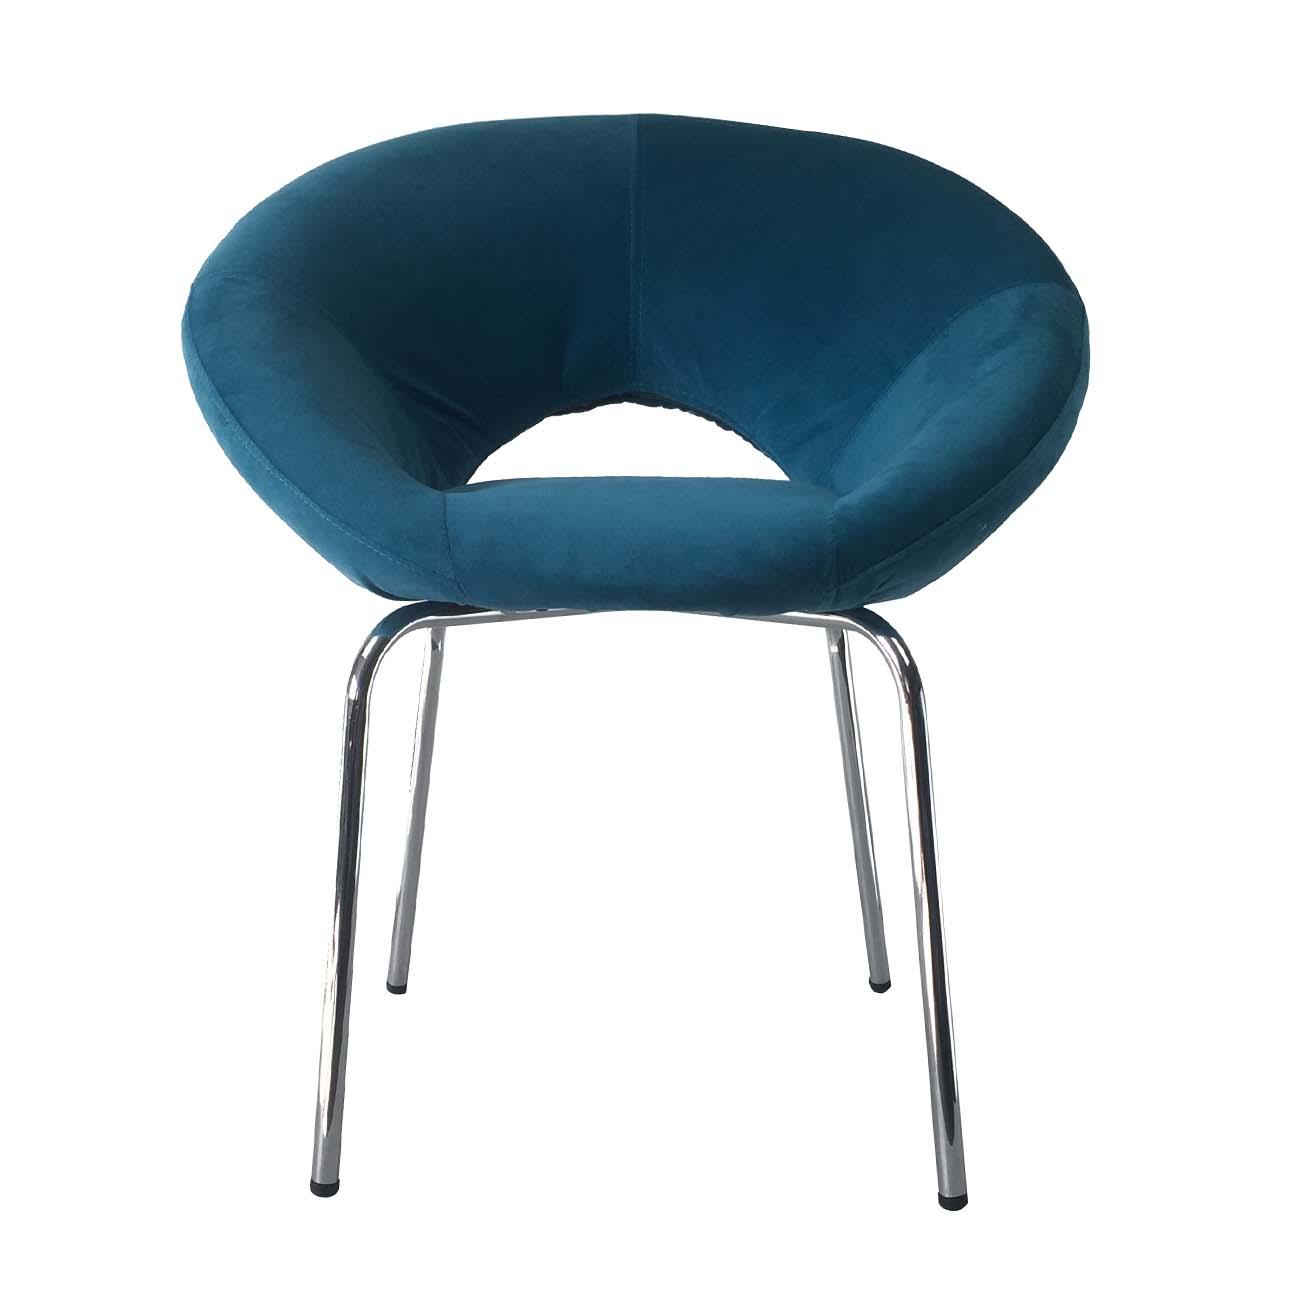 Fancy Red Shaped Pillow Soft Sponge Modern Style Cafe Chair Fabric Metal Chromed Best Design Children Use Breakfast Egg